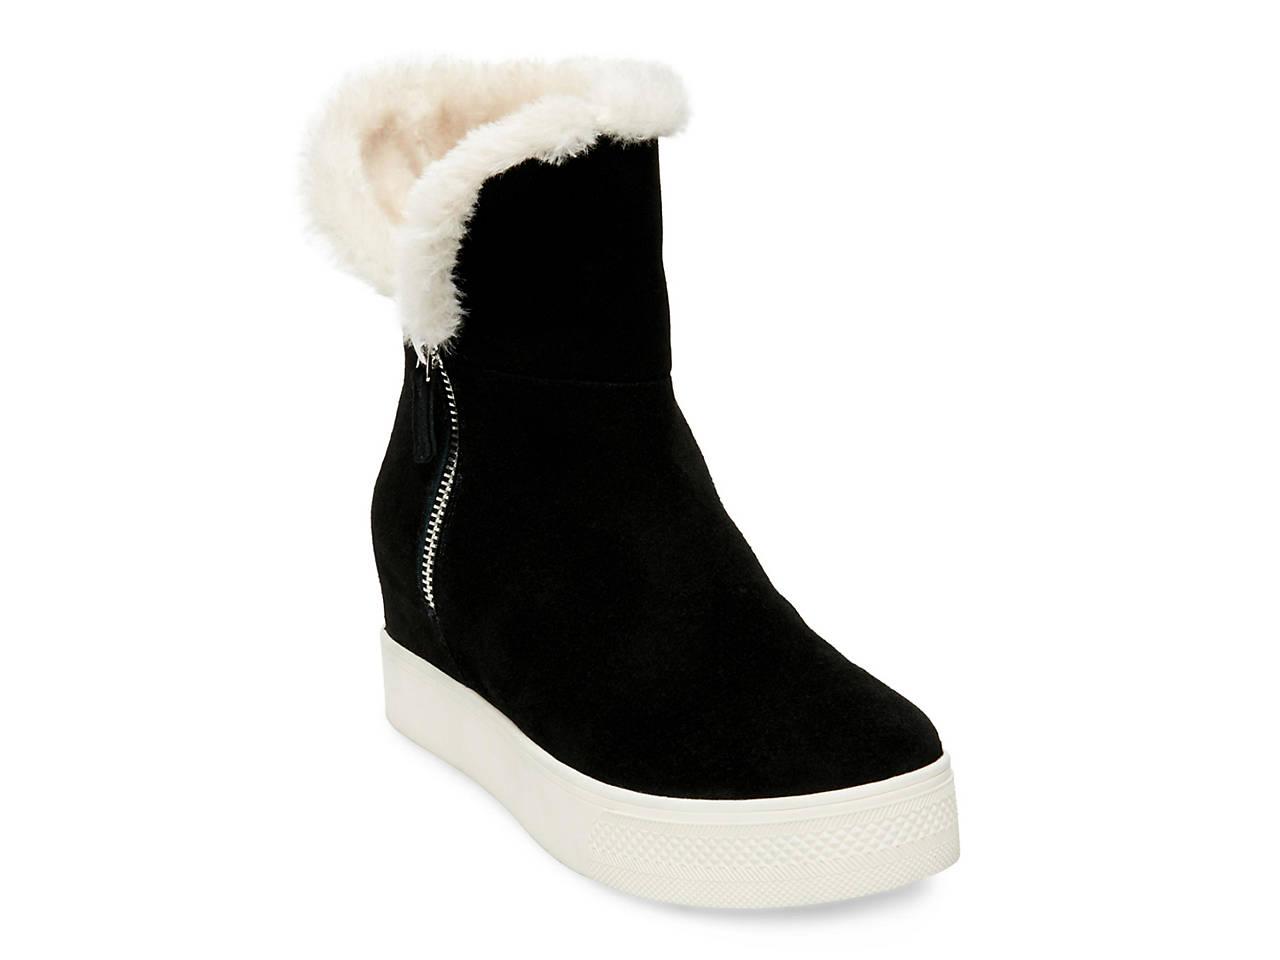 8f1891b985e1fb Steve Madden Weston Wedge Bootie Women s Shoes